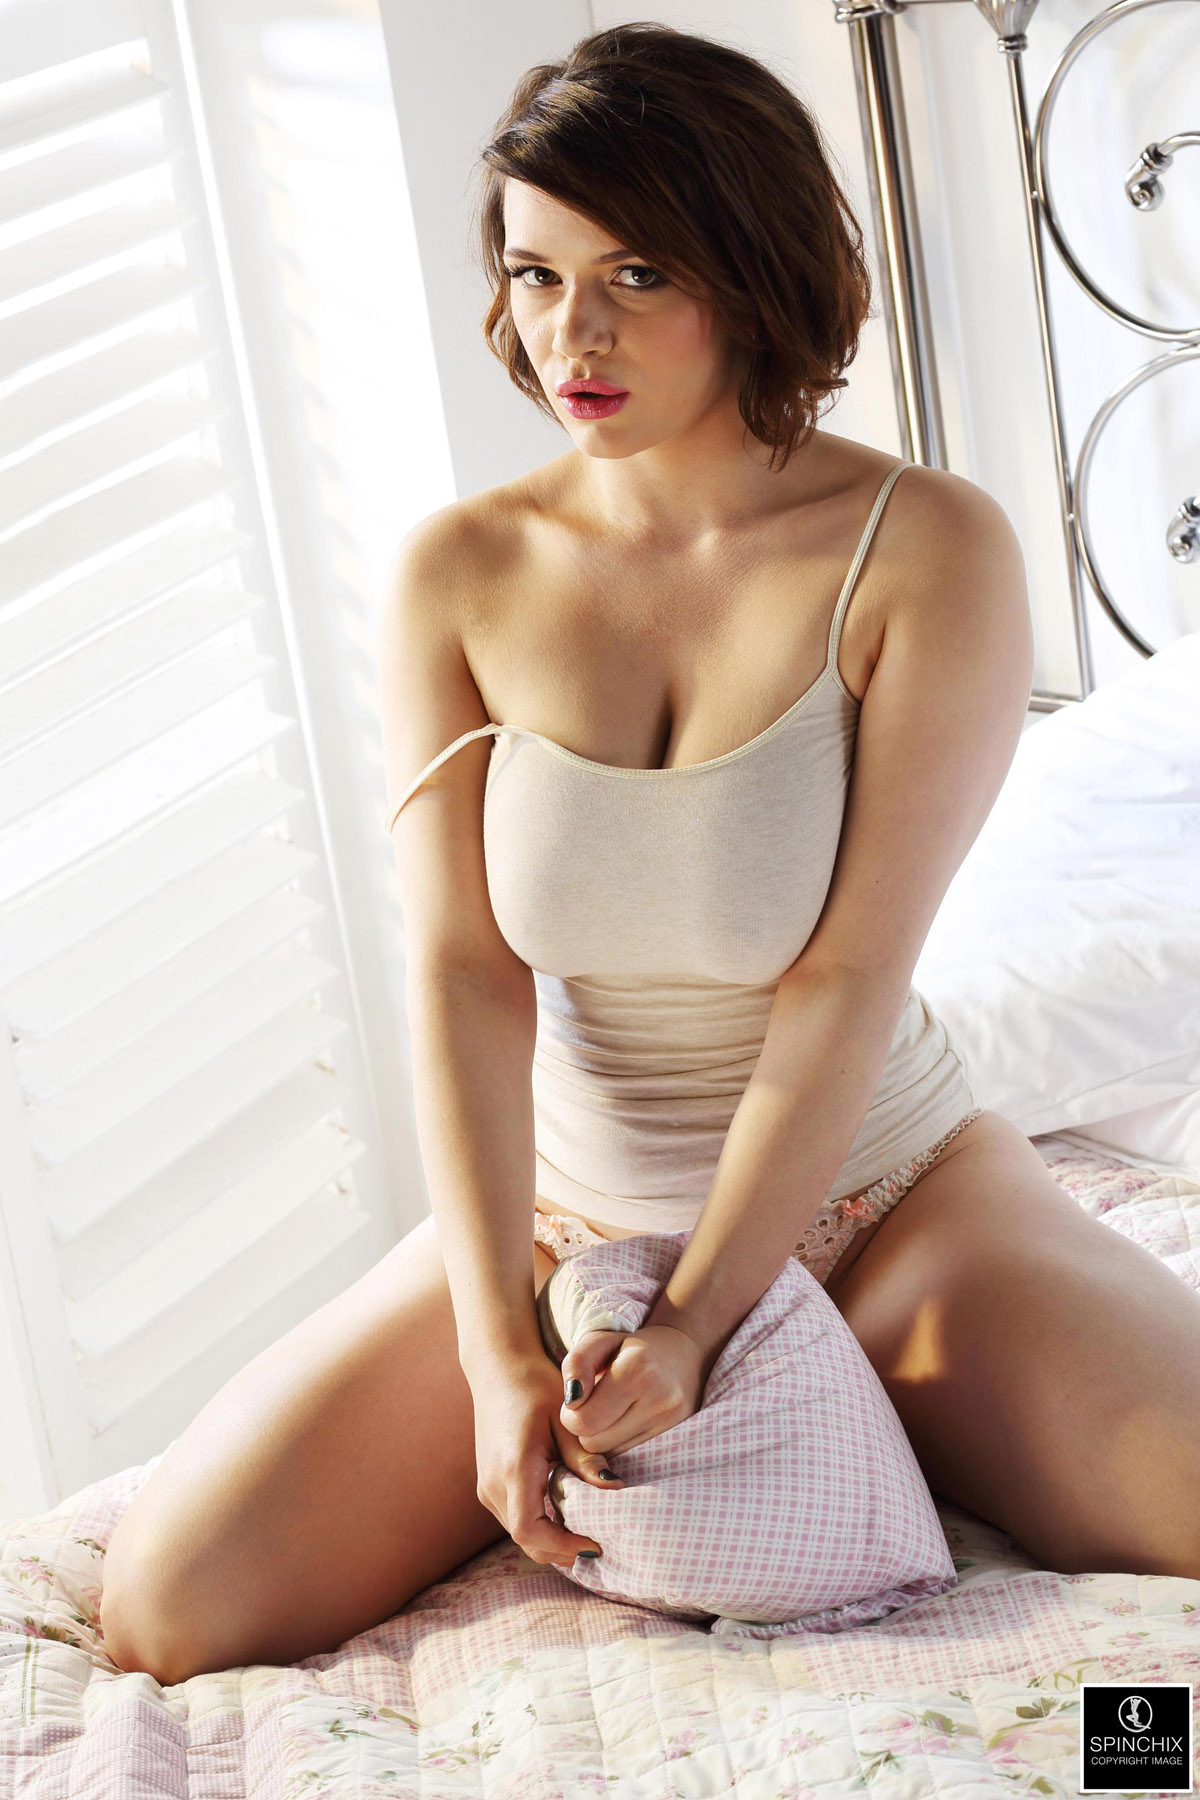 Asian business woman groping